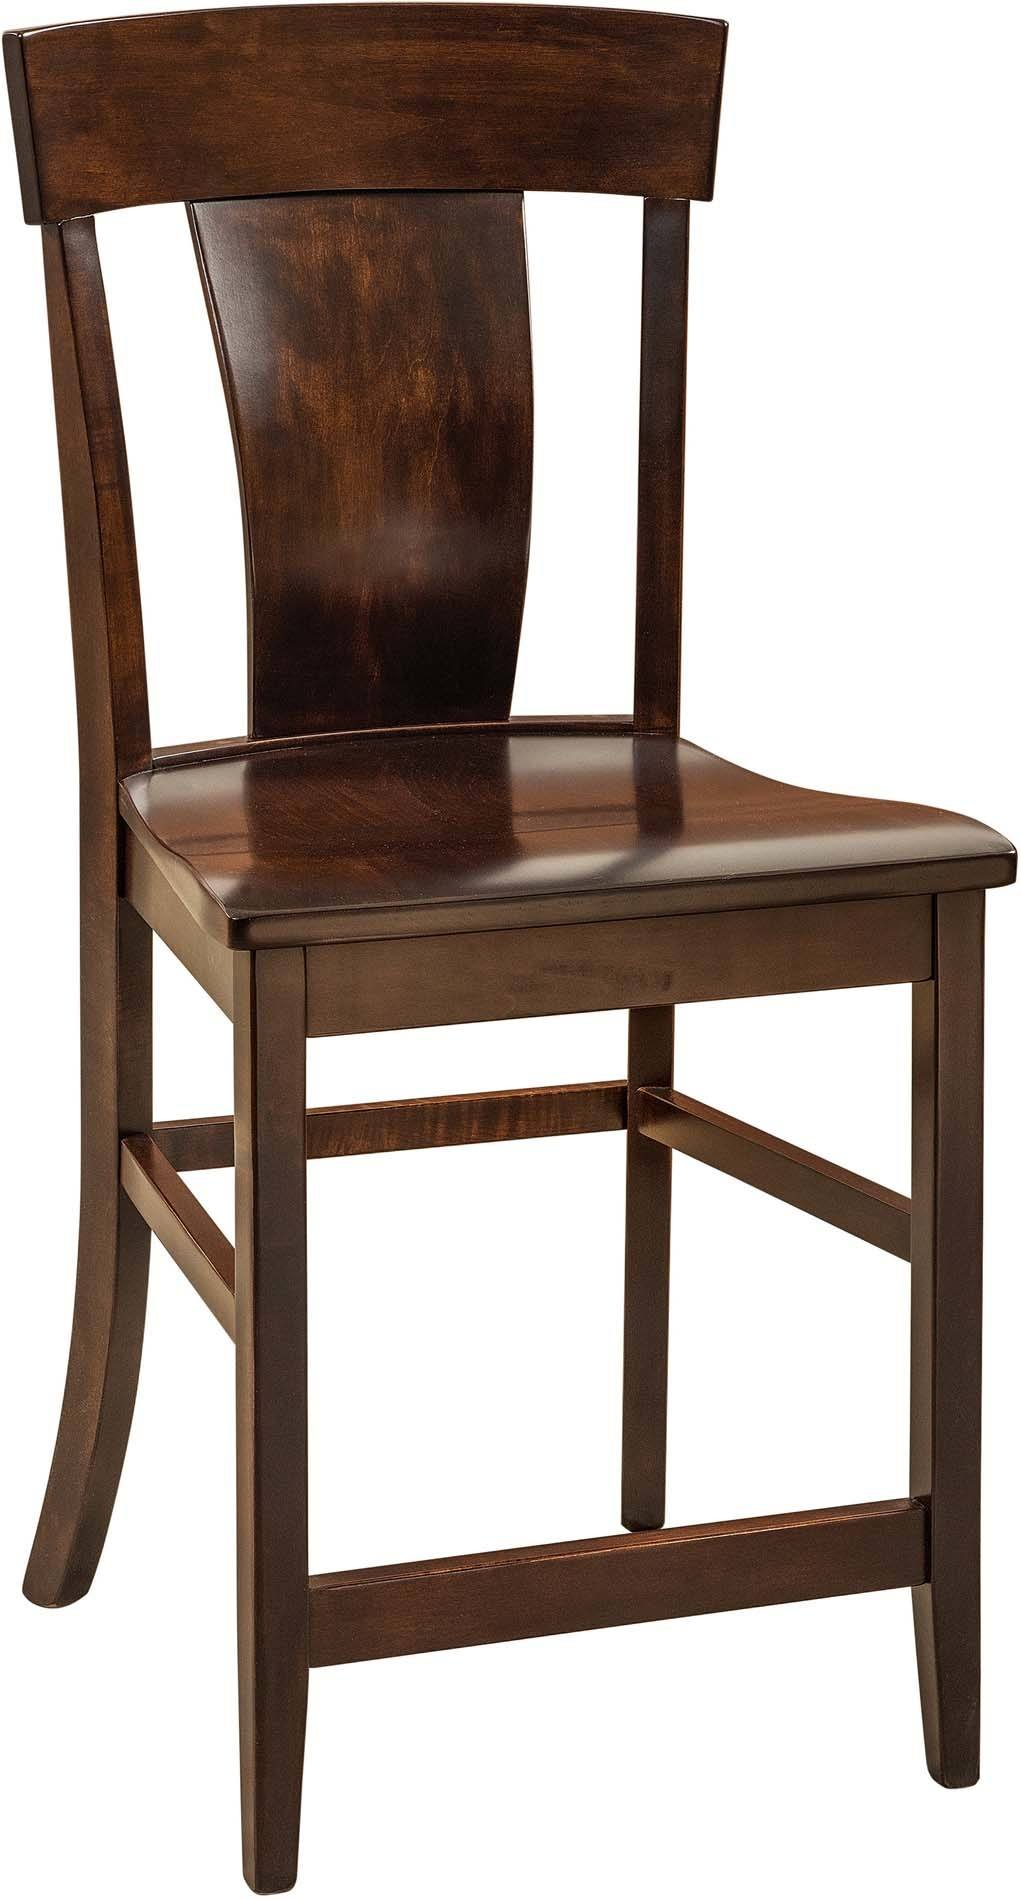 Bar Stools Amish Furniture by Brandenberry Amish Furniture : baldwin barstool from www.brandenberryamishfurniture.com size 1021 x 1900 jpeg 106kB